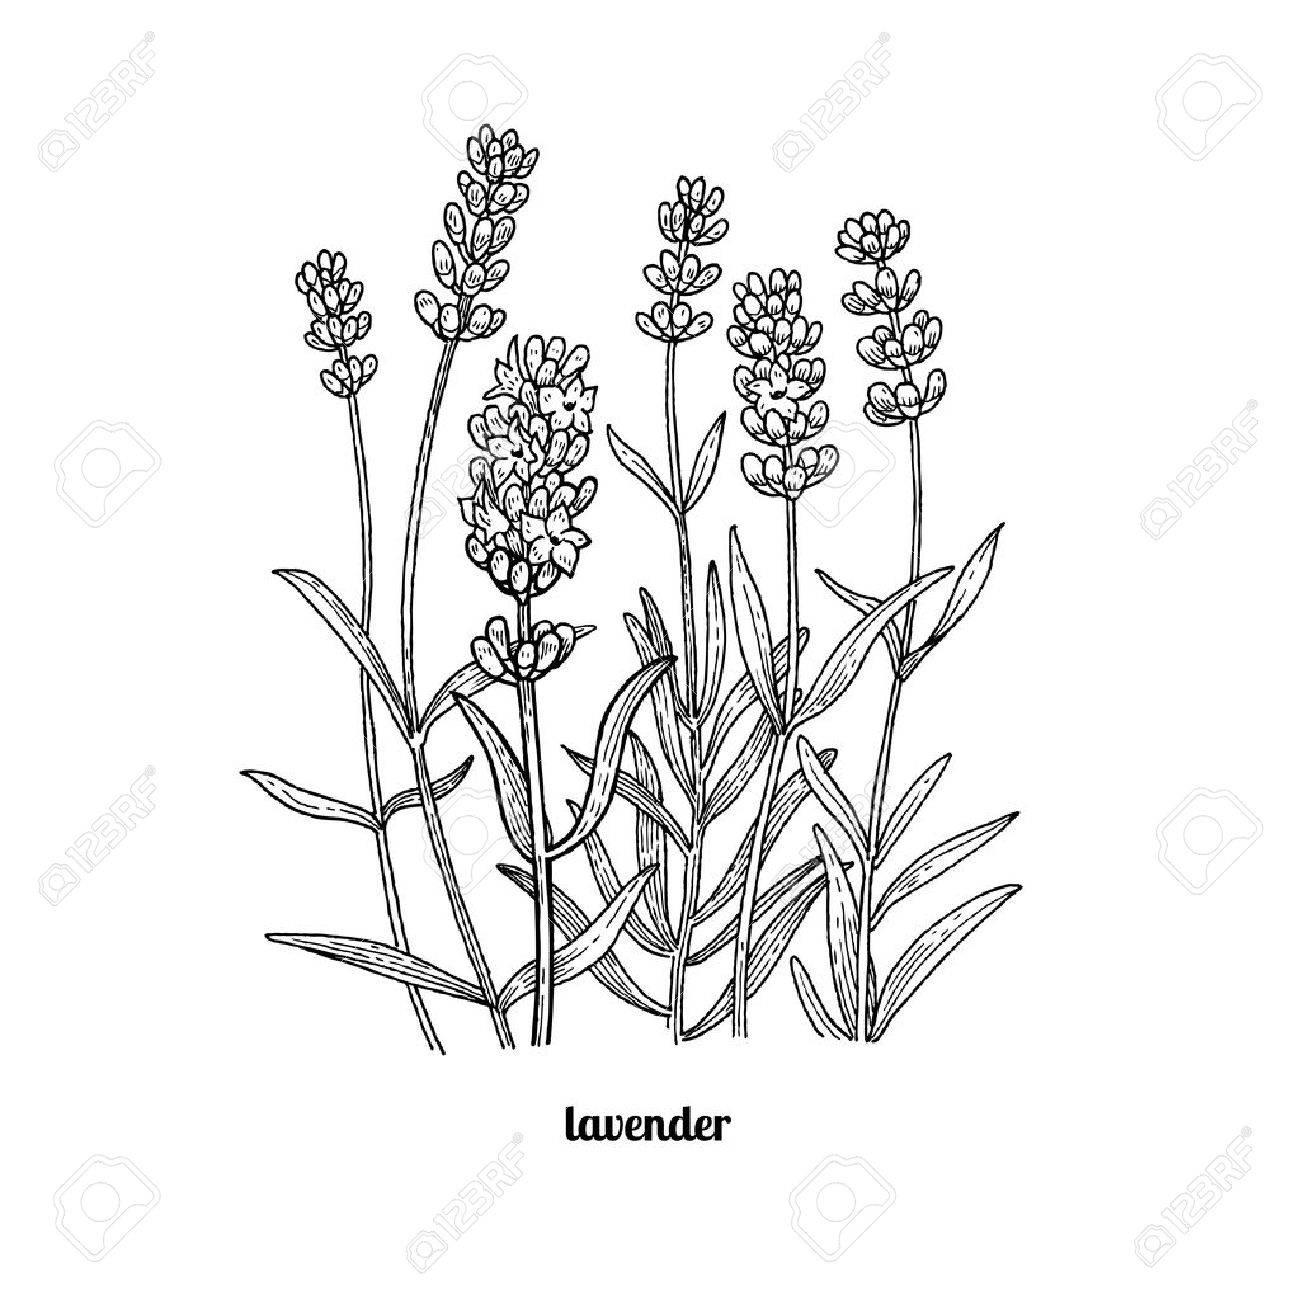 Lavender Line Drawing At Getdrawings